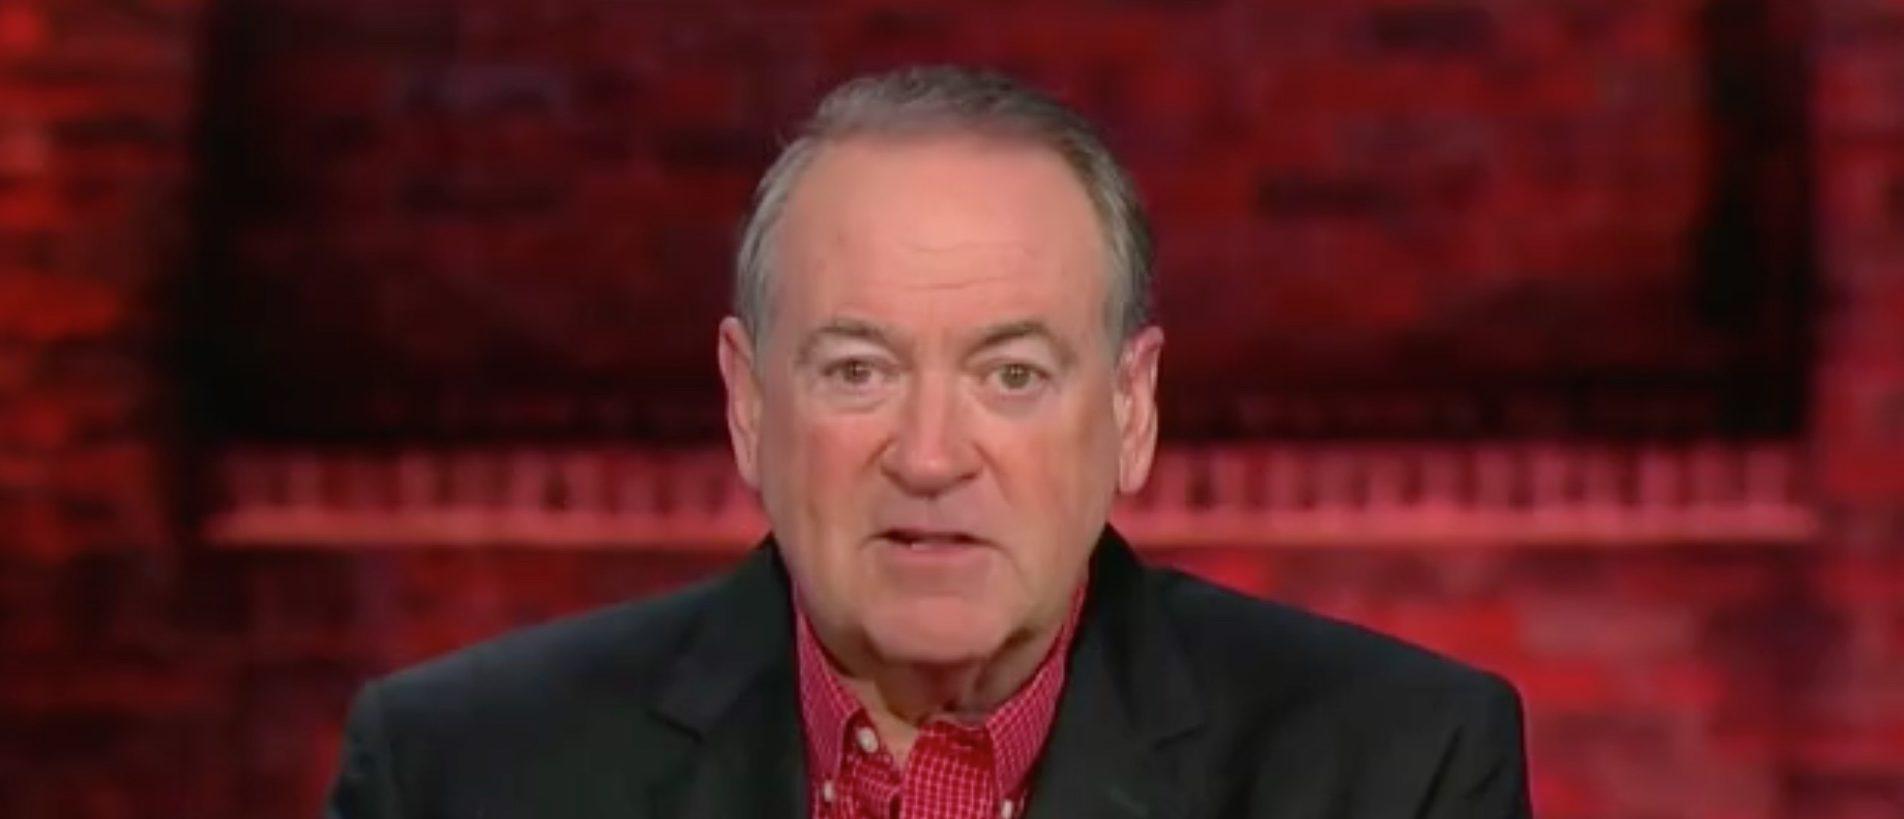 Mike Huckabee Wants NYT Op-Ed Author 'Frog-Marched Across Washington'